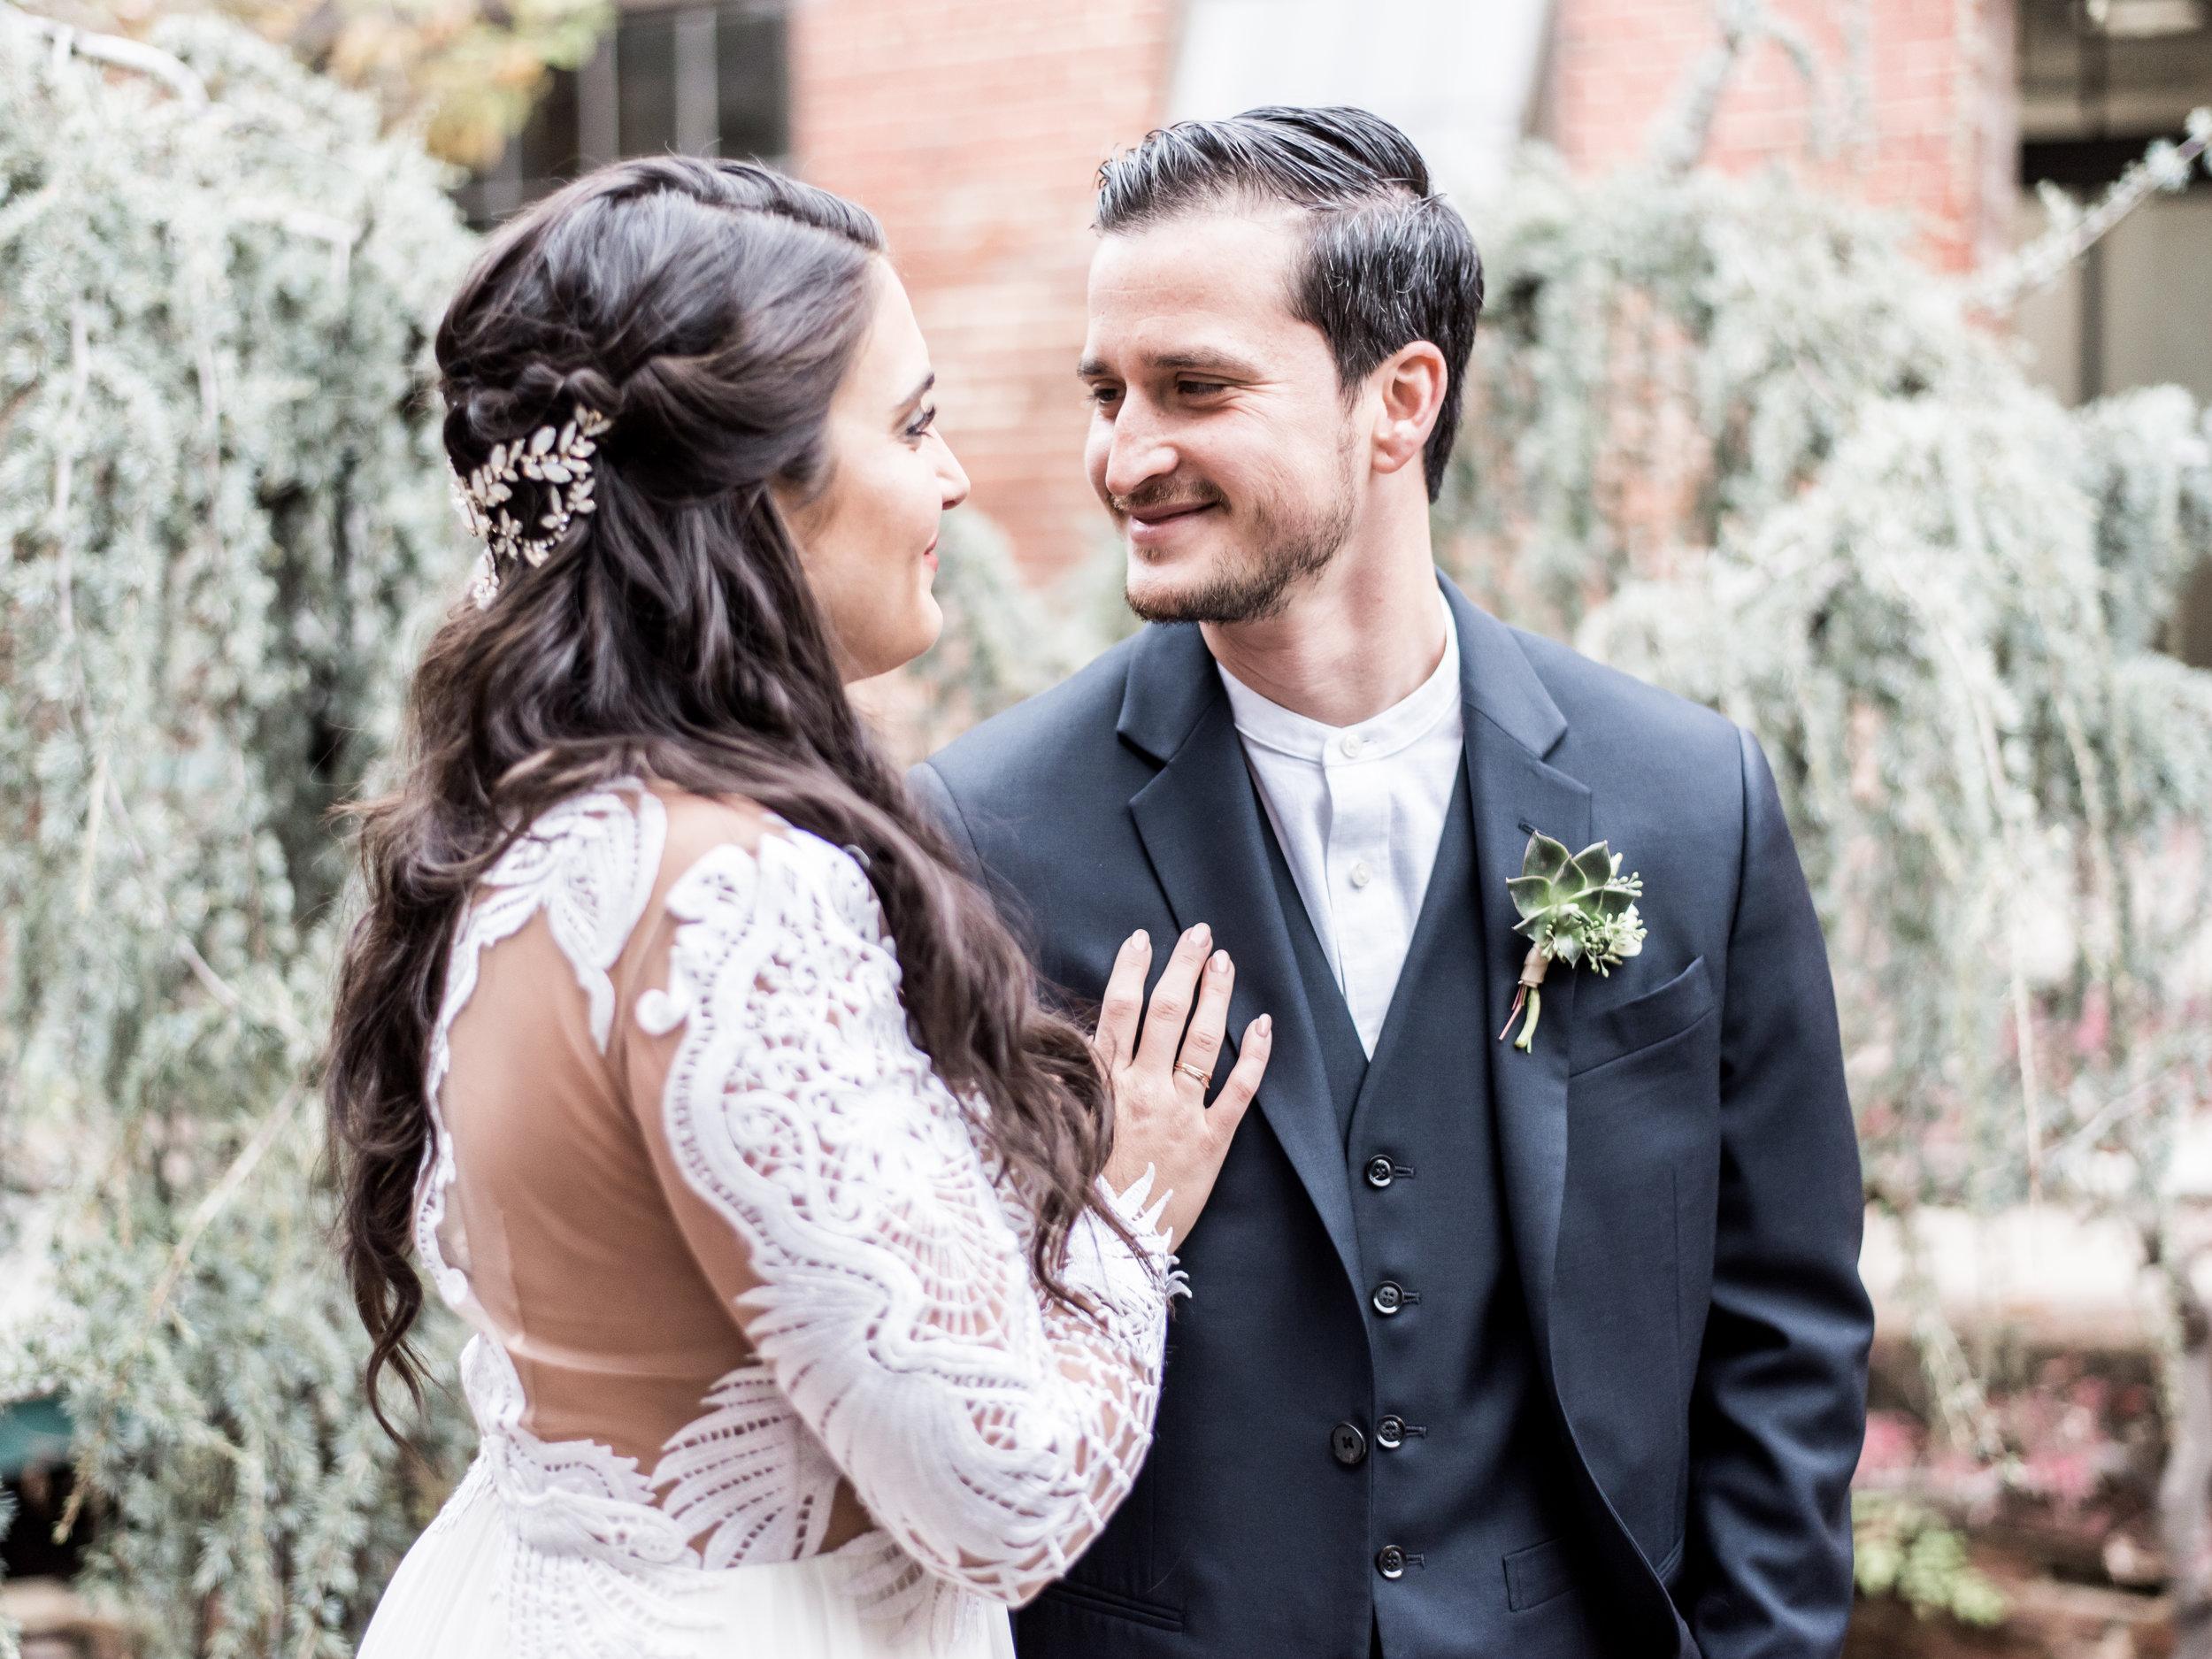 Boho bride gets married in a garden in Atlanta Georgia